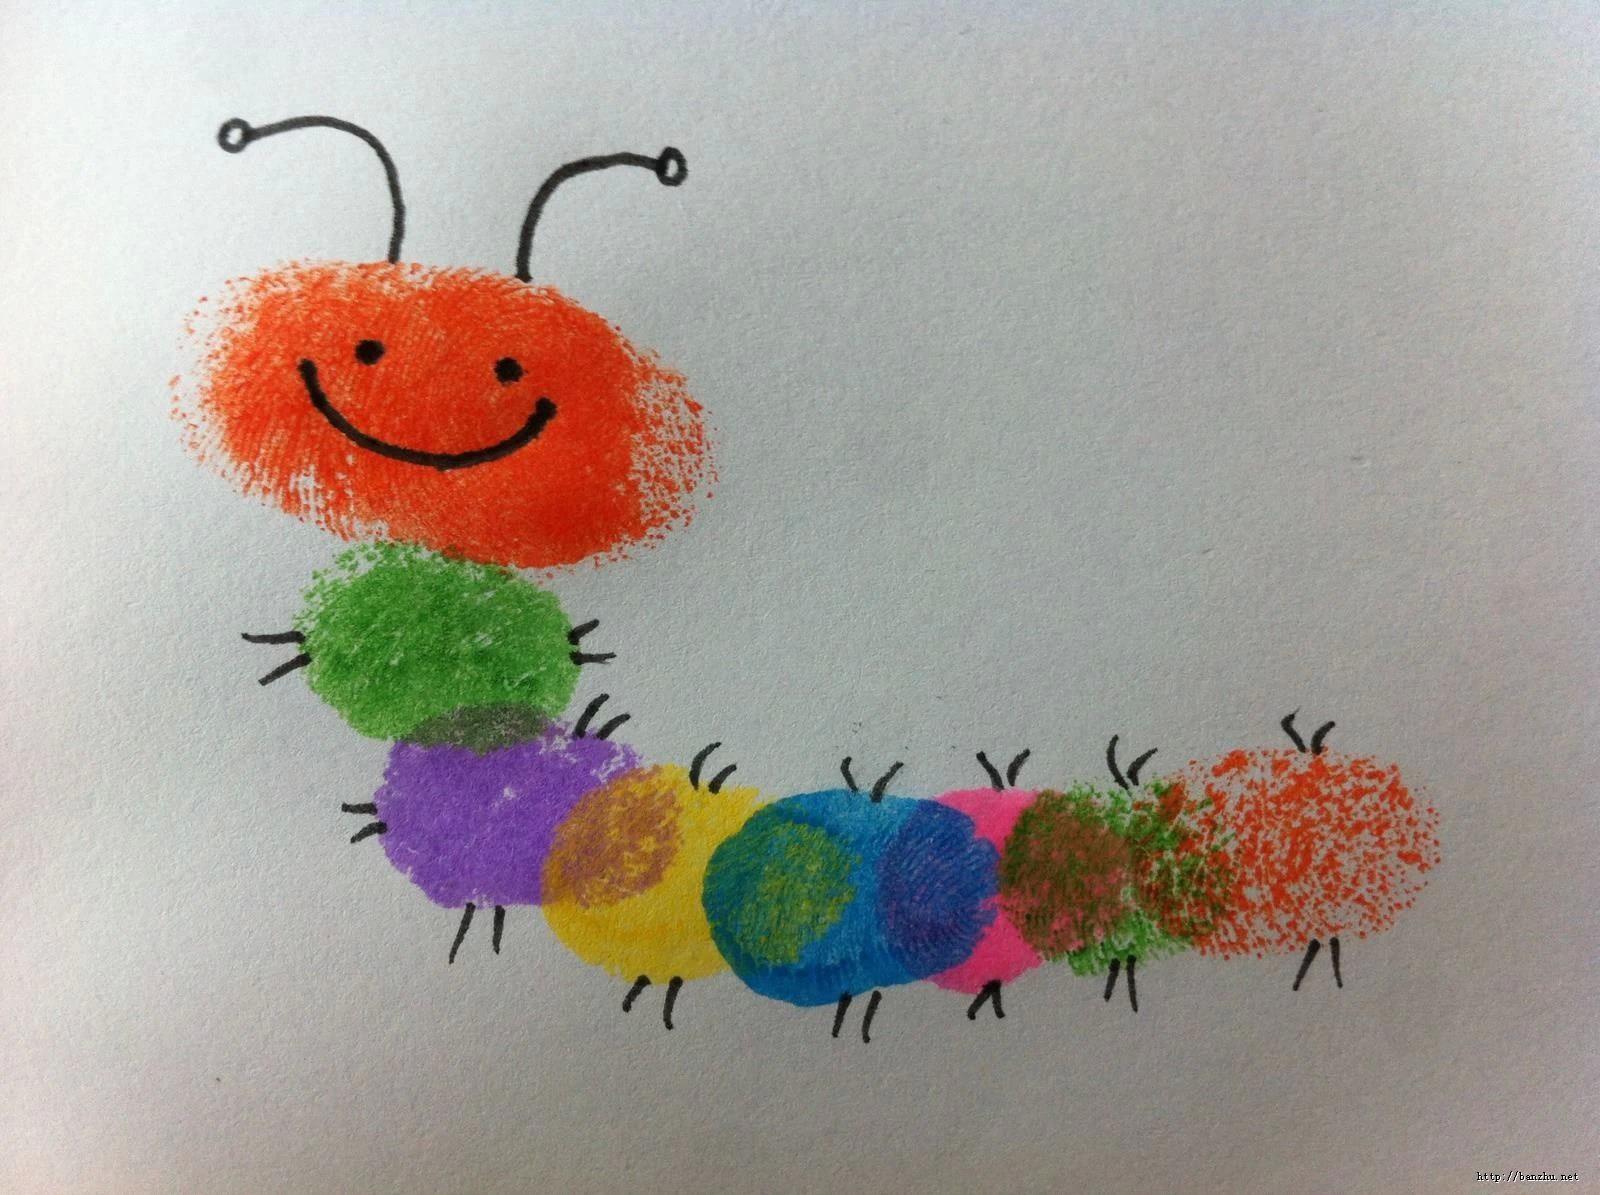 Some Creative Fingerprint Doodles May Bring You